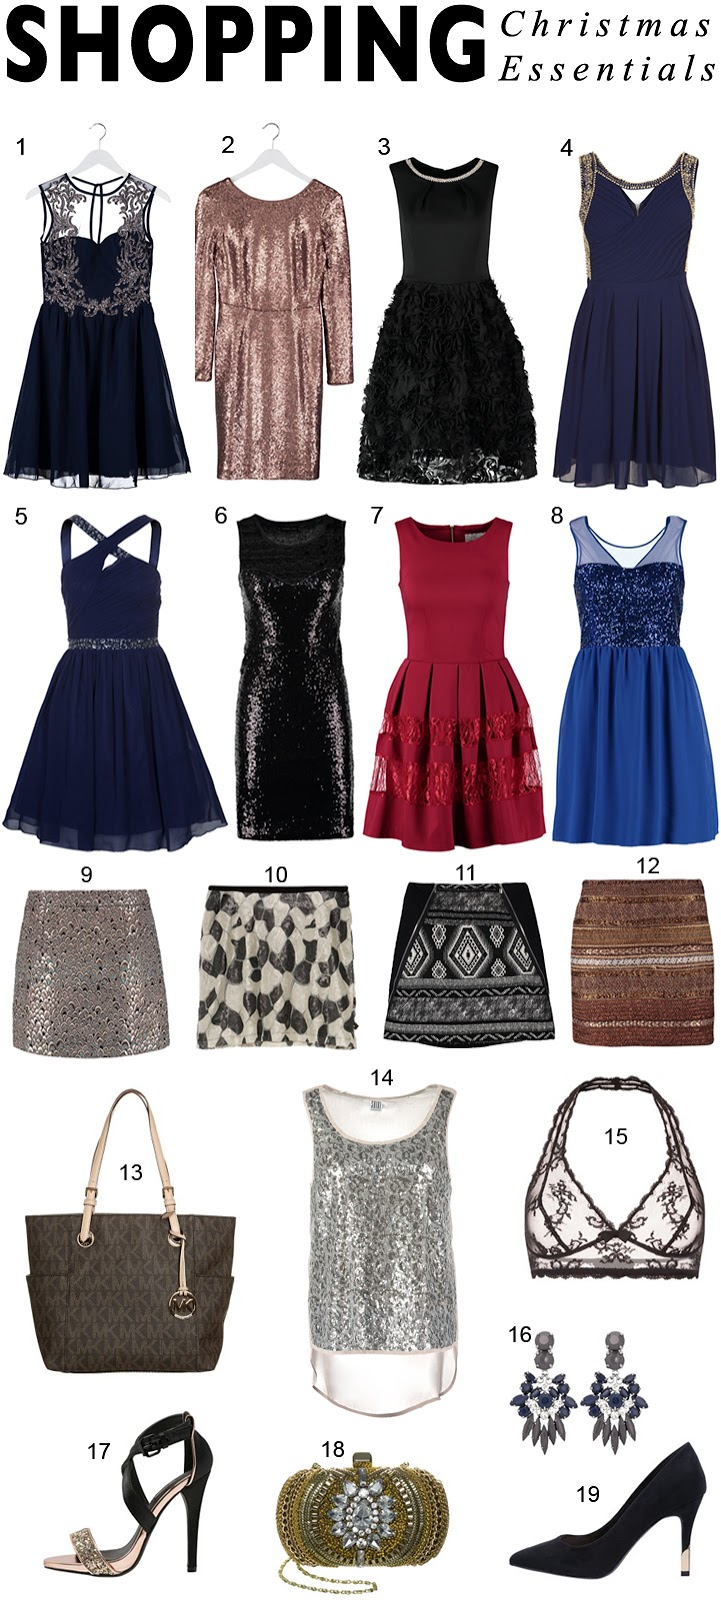 Shopping Christmast Essentials-87-stella